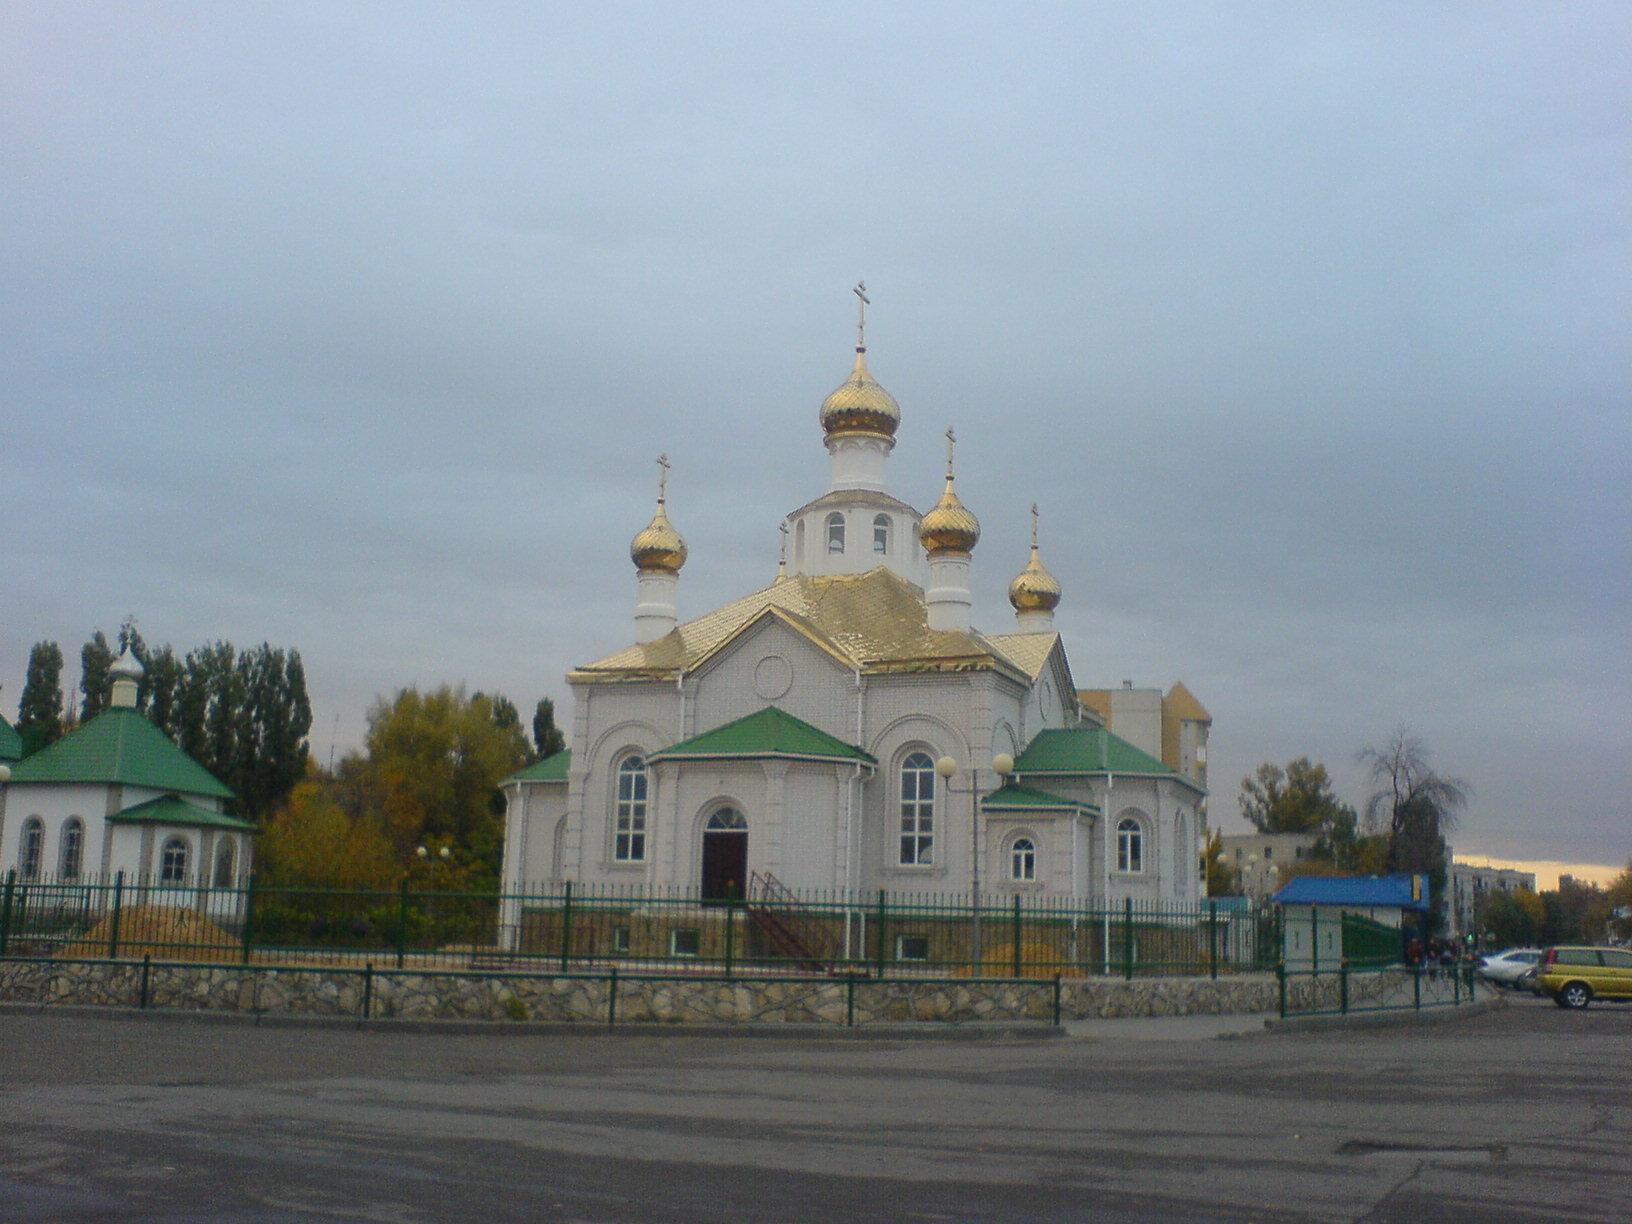 волгоградская область фролово знакомство